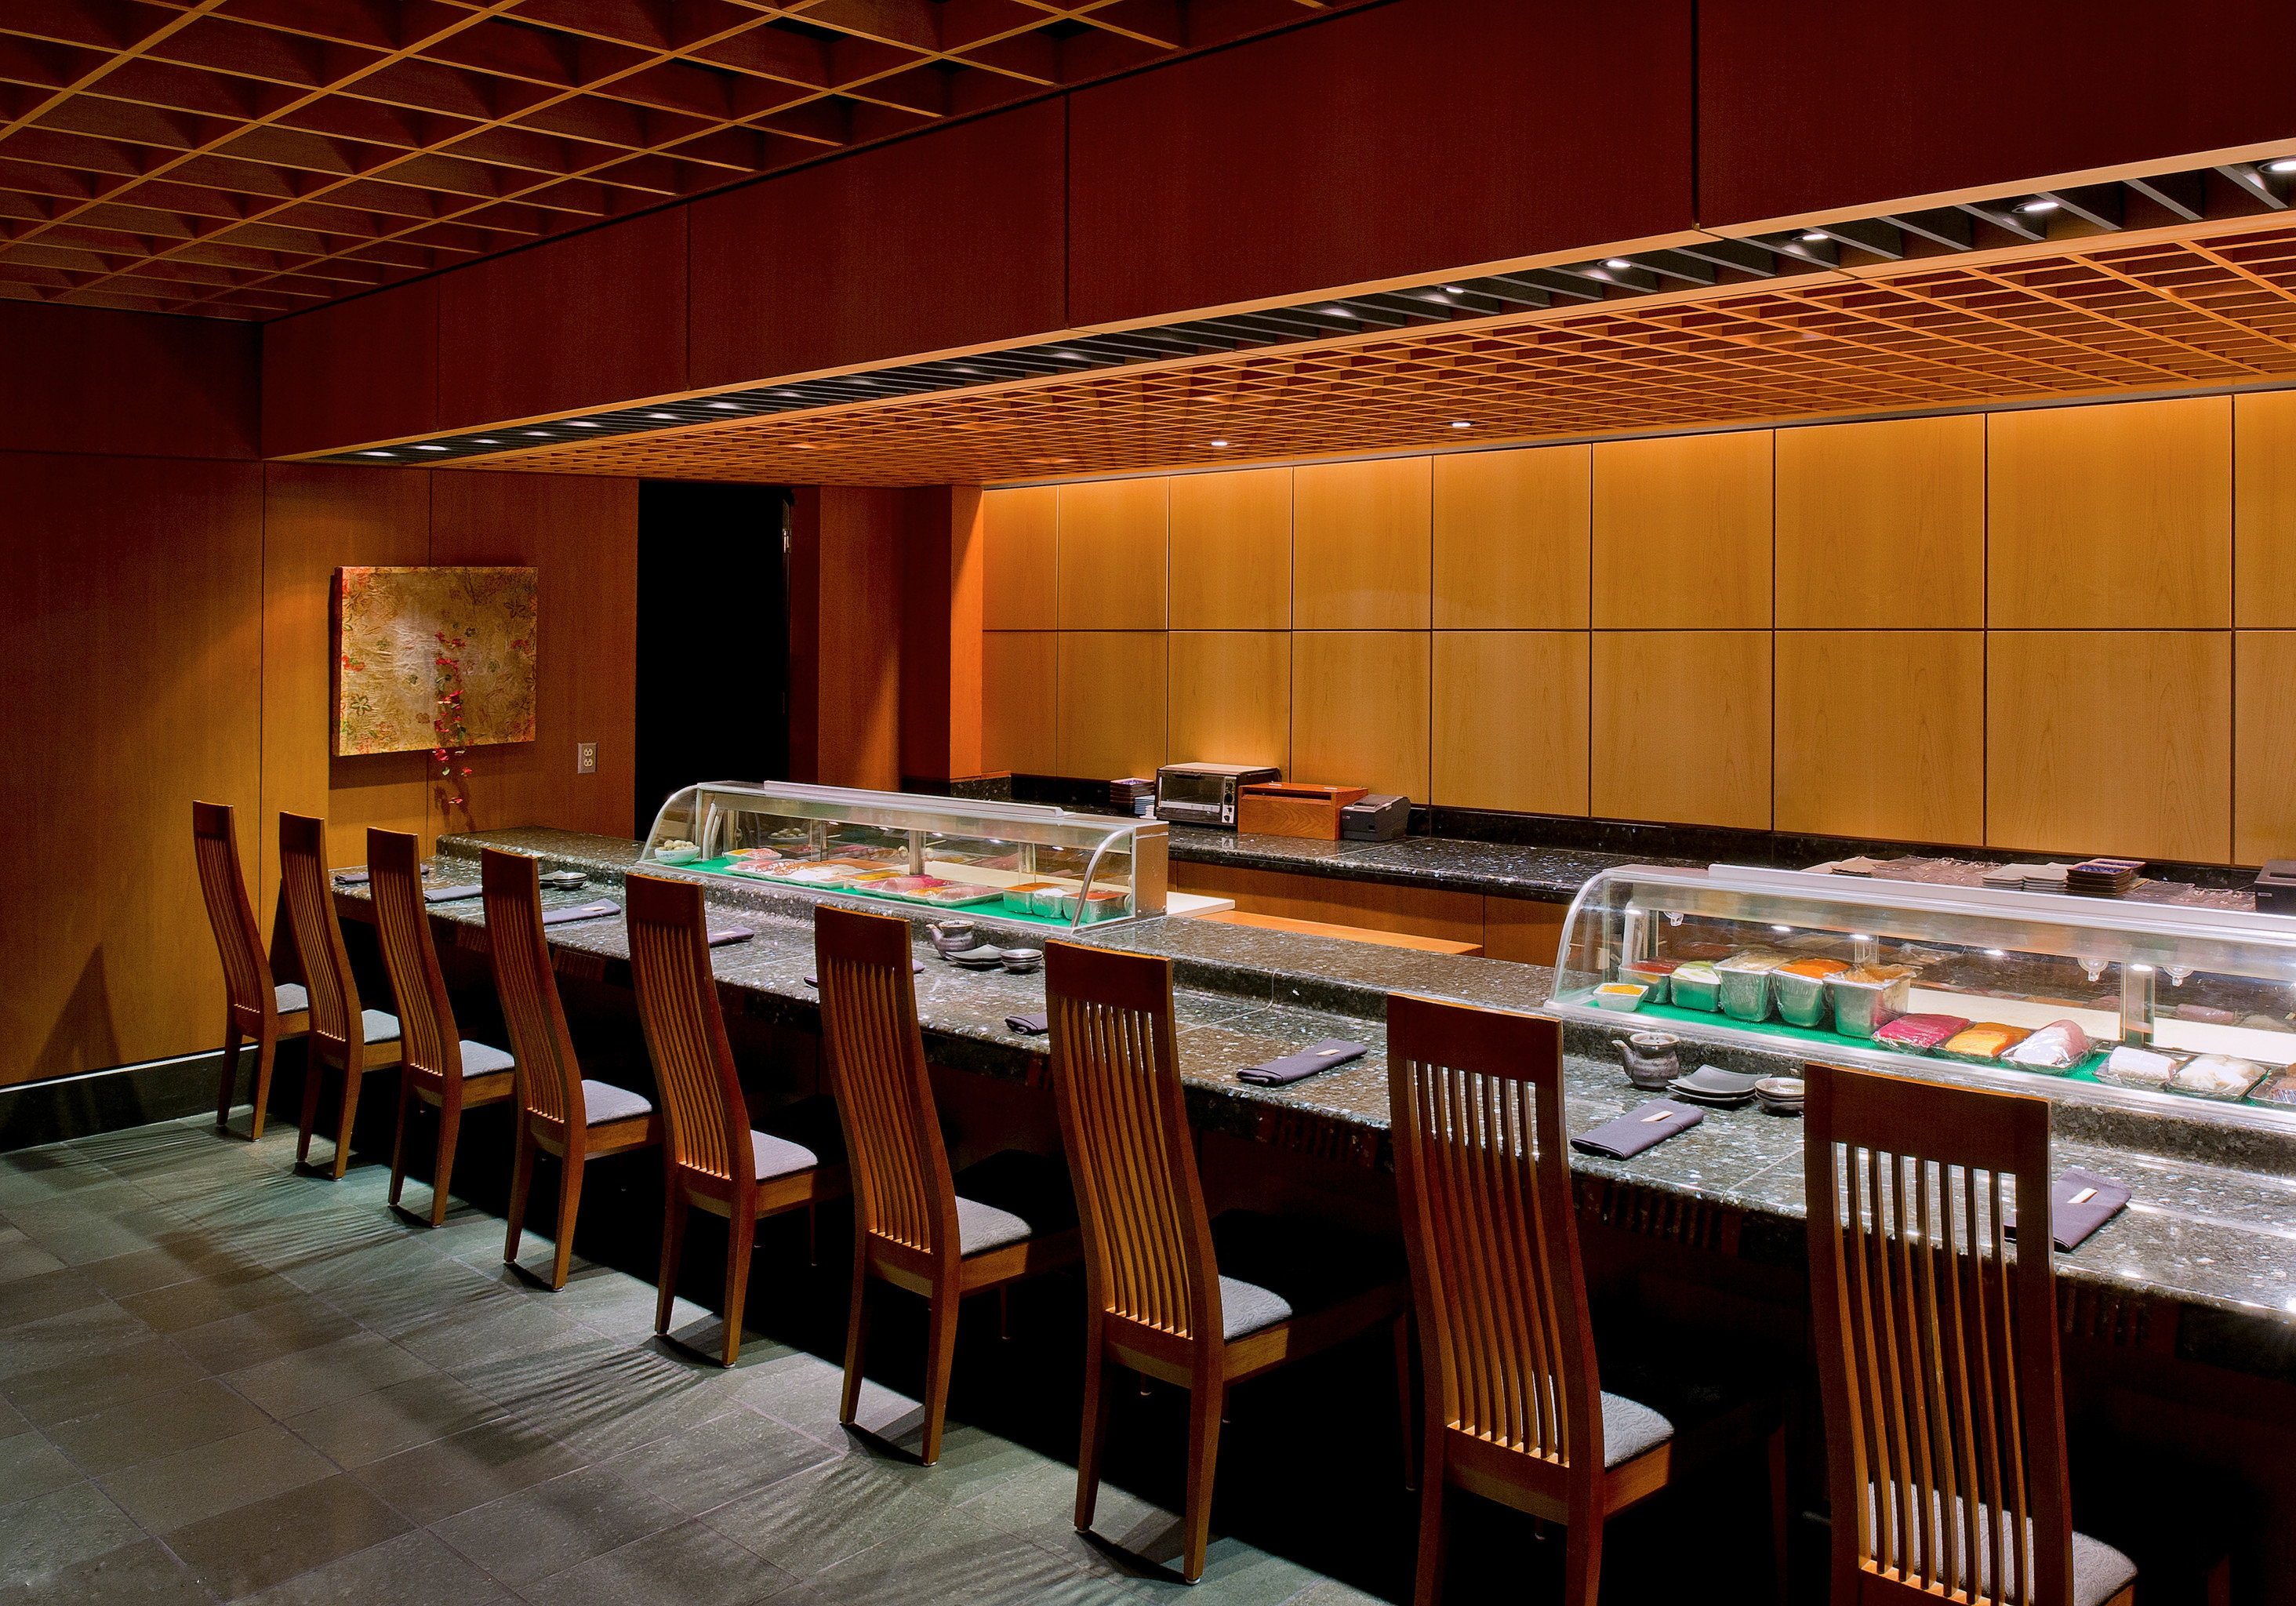 Bar Dining Drink Eat auditorium chair restaurant